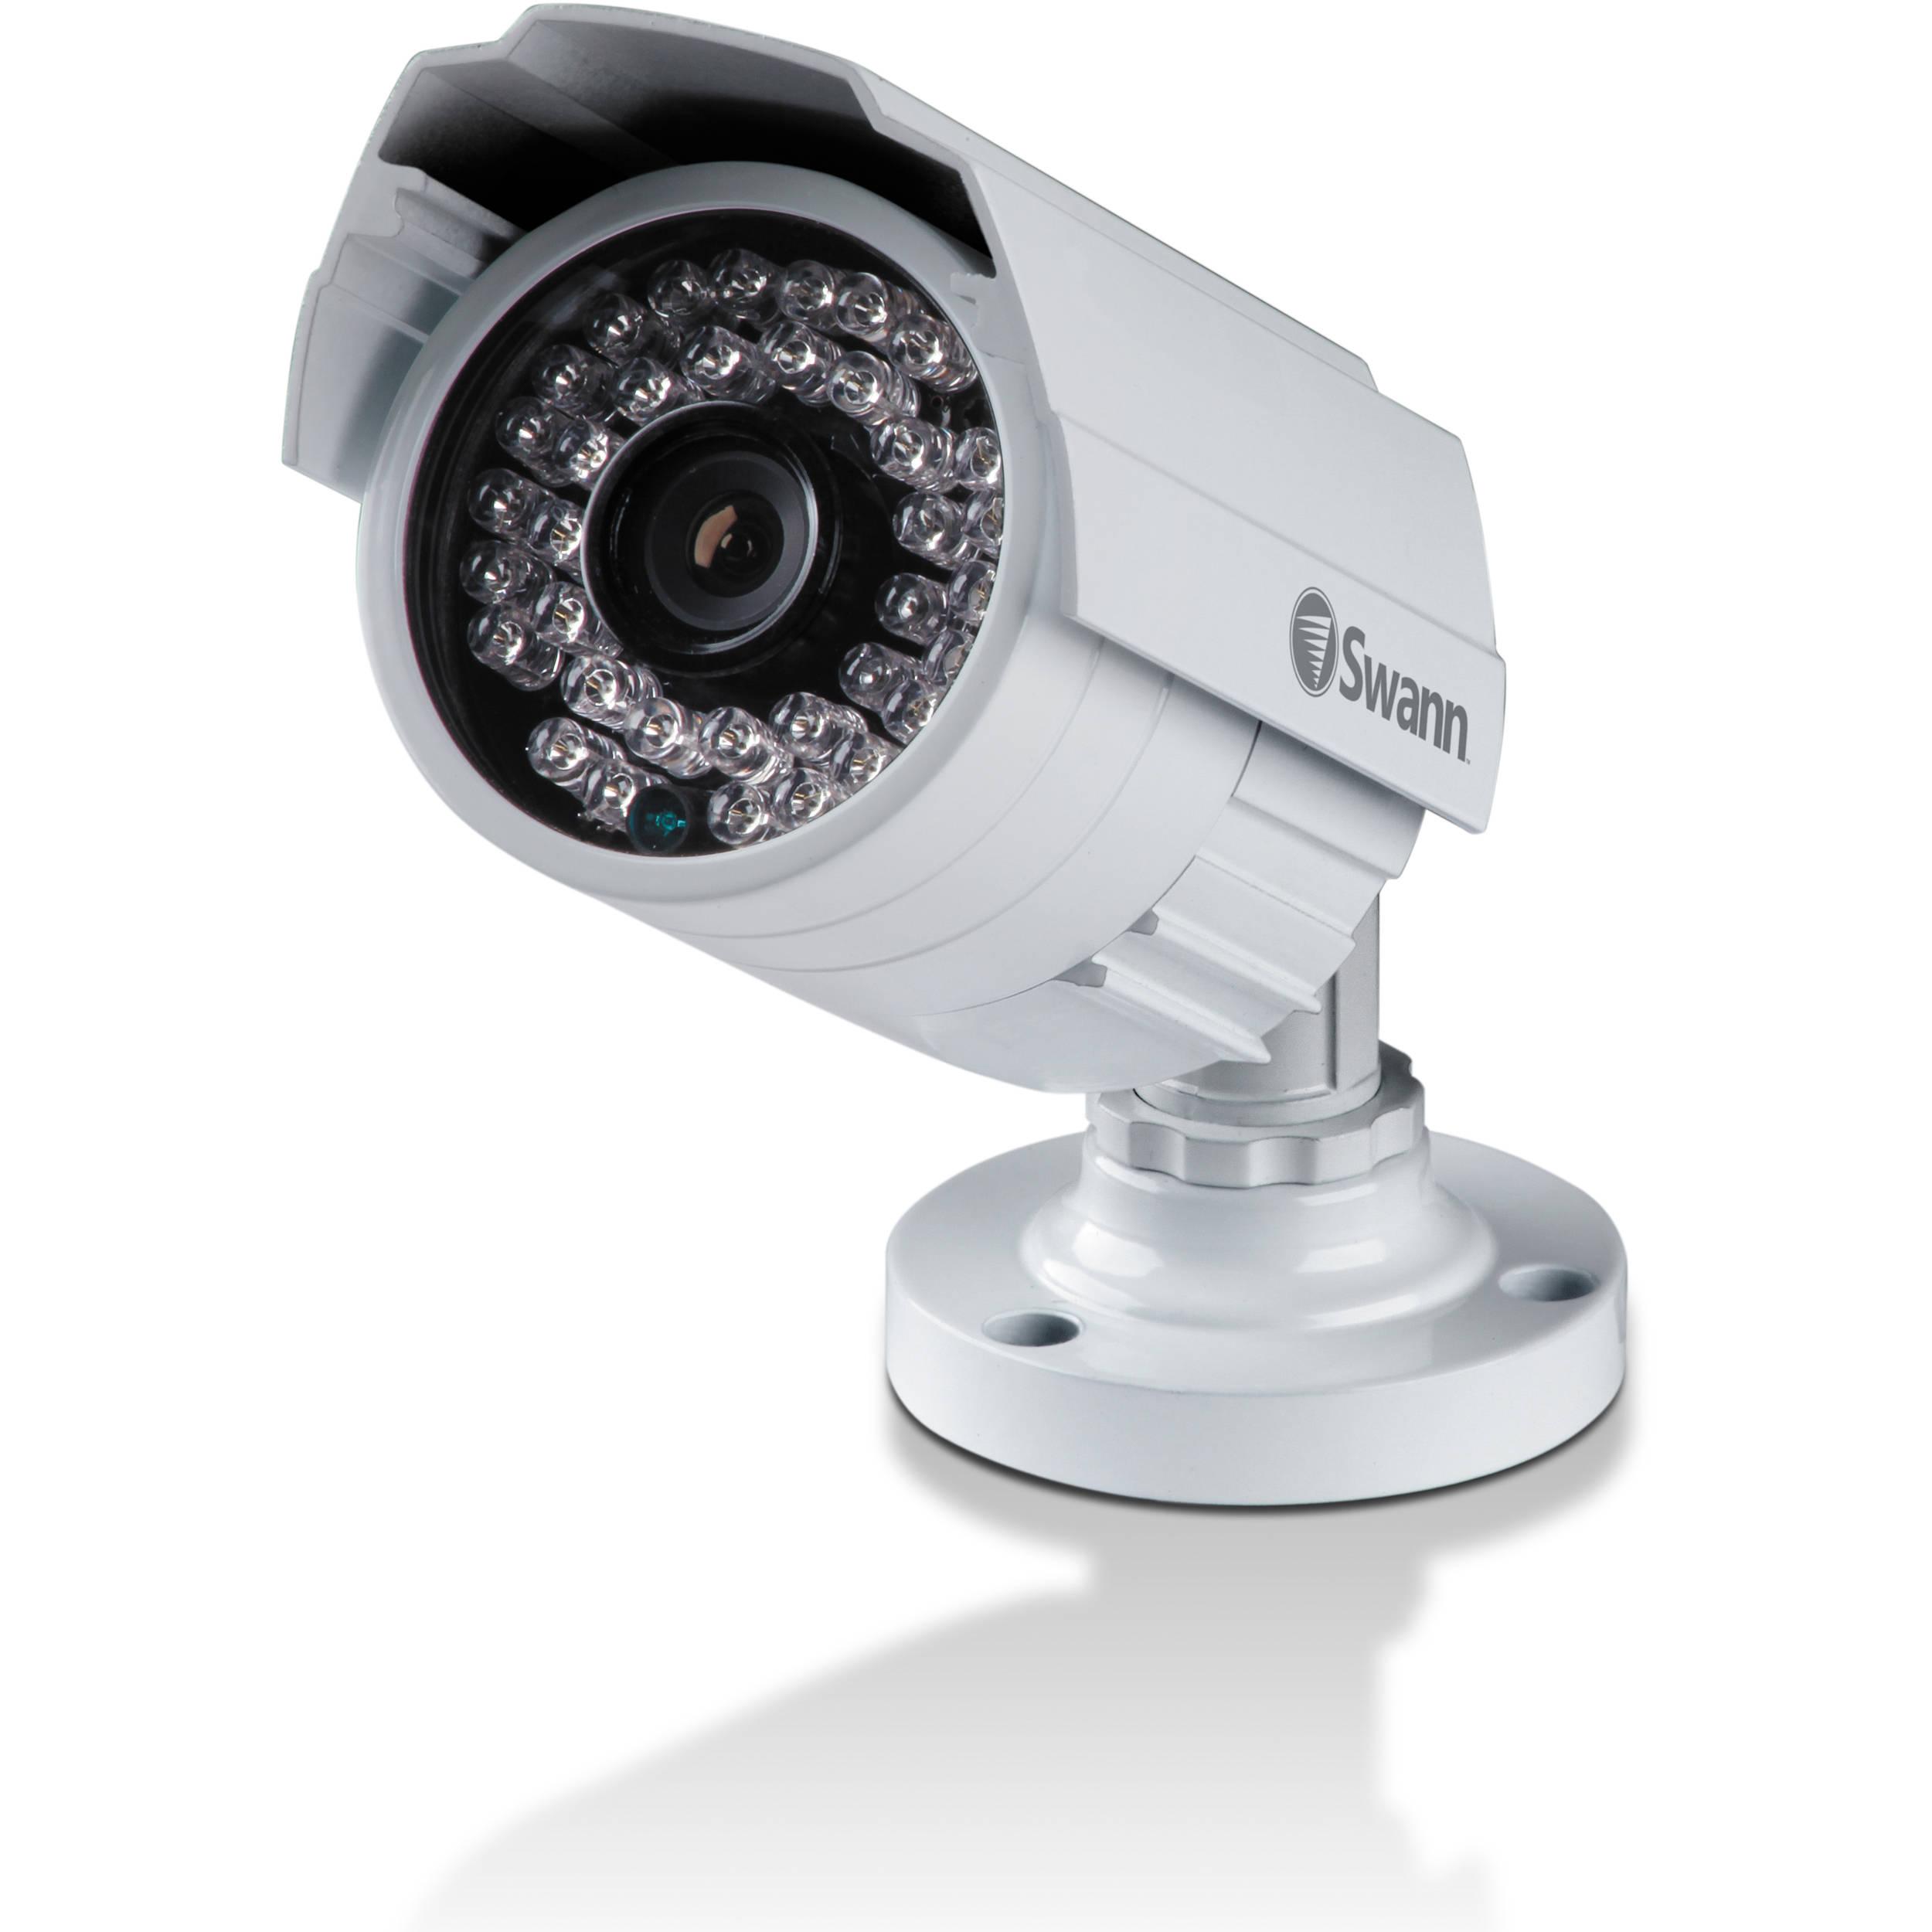 Swann 960h 700 Tvl Day Night Ir Bullet Camera Swpro 642cam Us